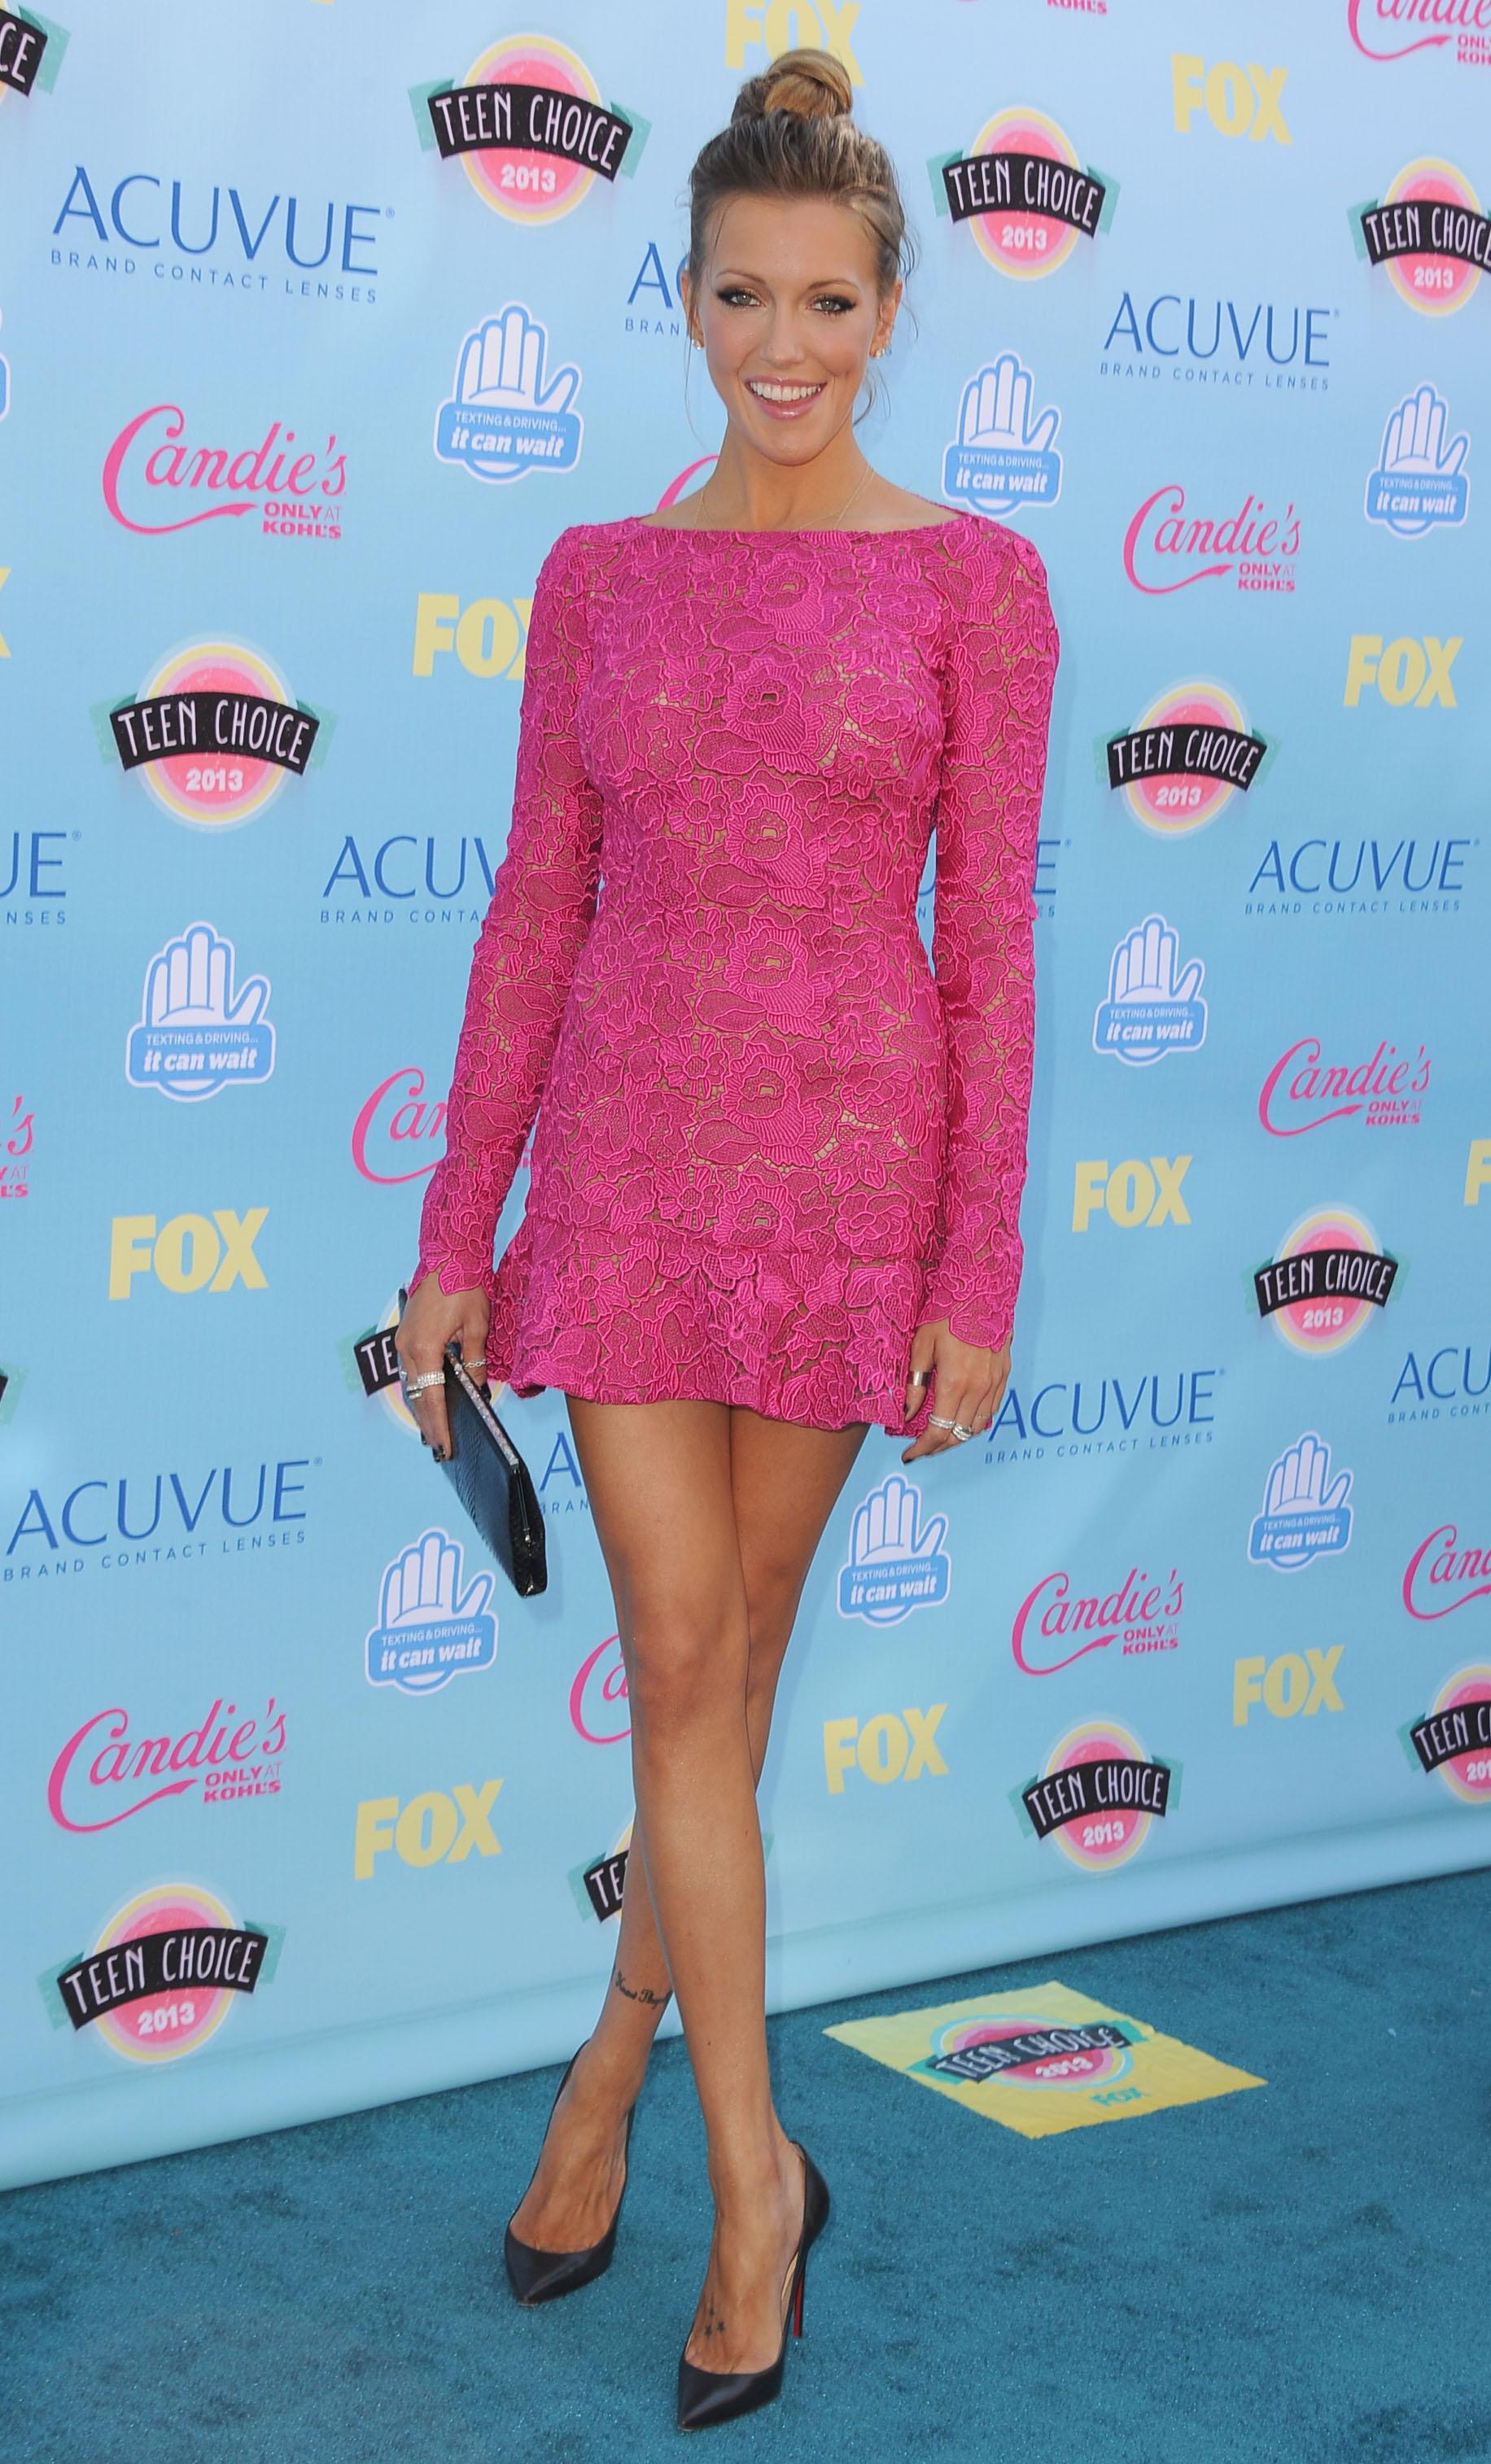 297469578_Katie_Cassidy_2013_Teen_Choice_Awards7_122_155lo.jpg